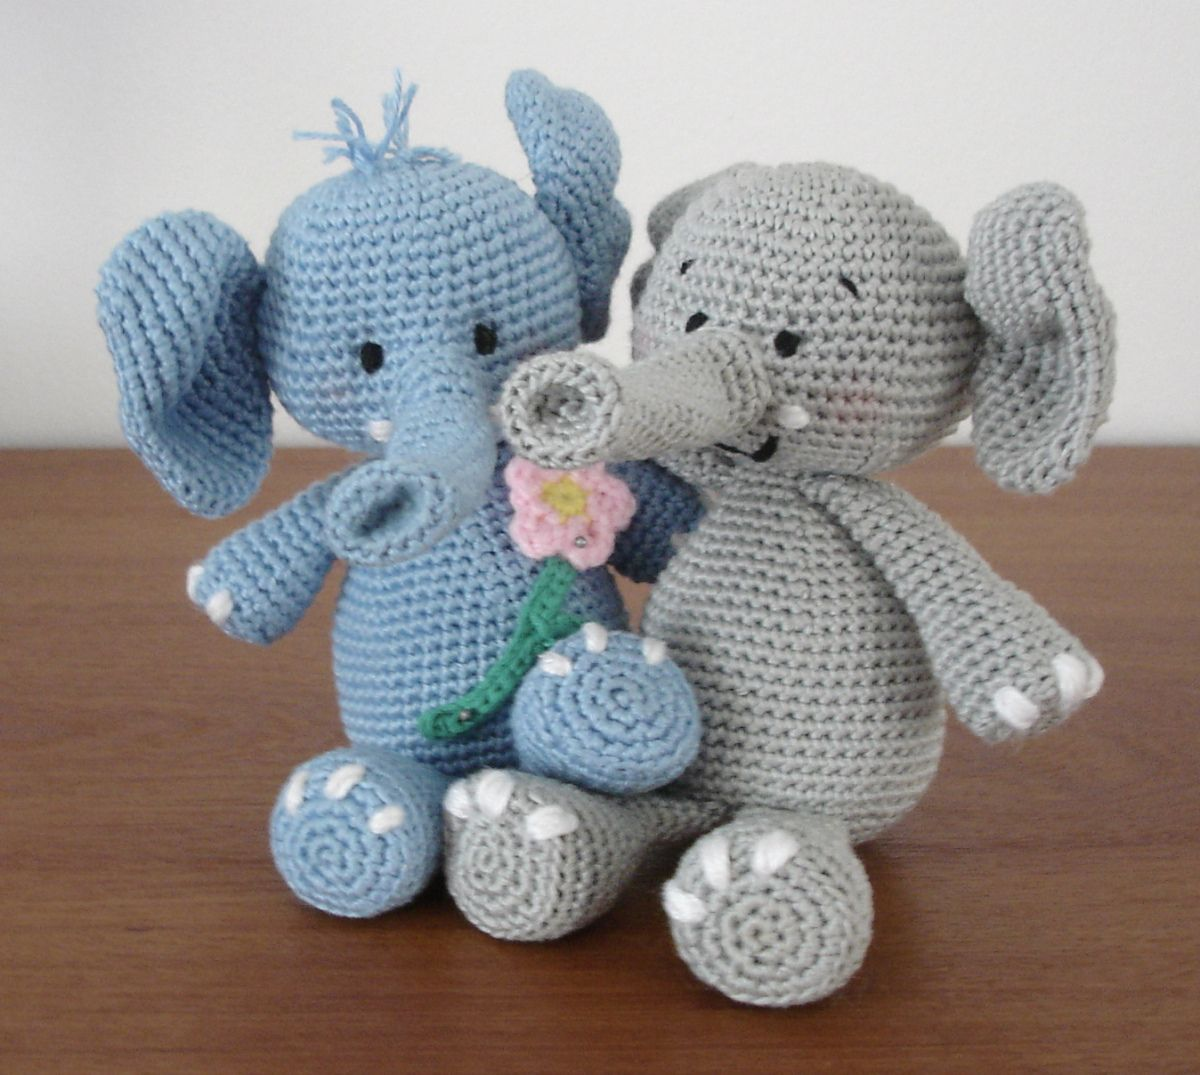 Crochet Stuffed Elephant Pattern Amazing Inspiration Design